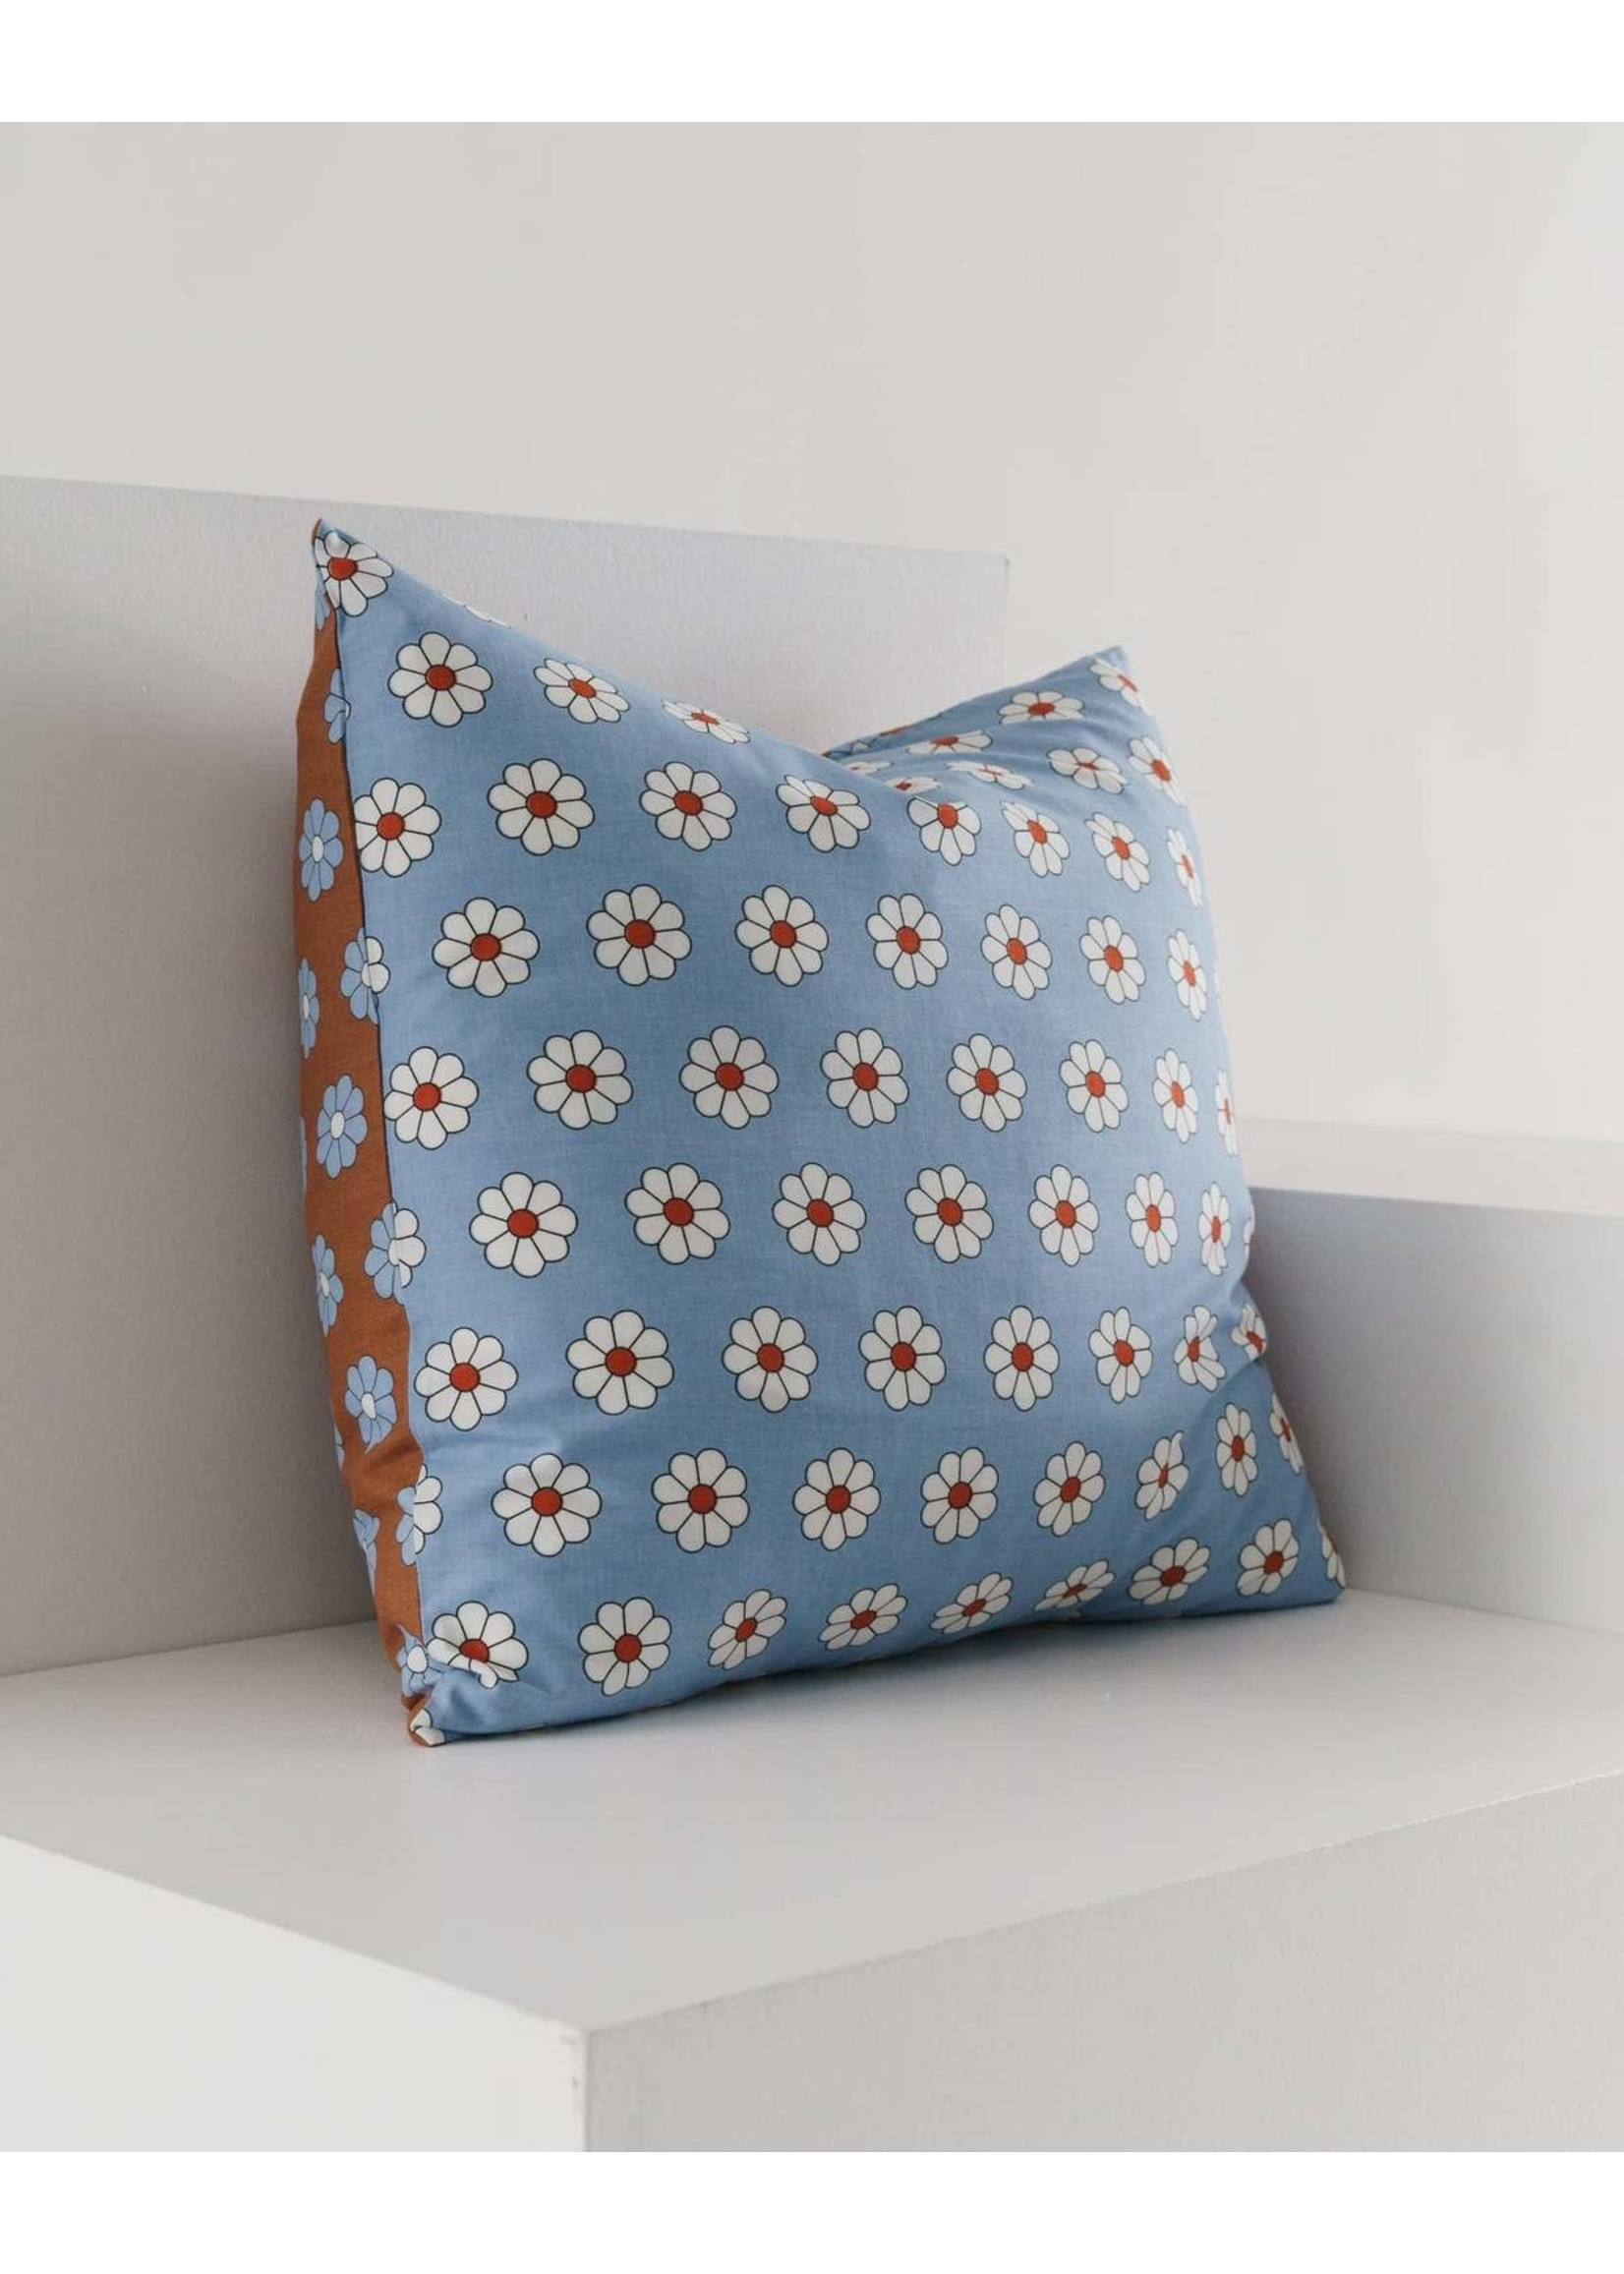 Baggu Baggu Throw Pillow Case - Daisy Mix